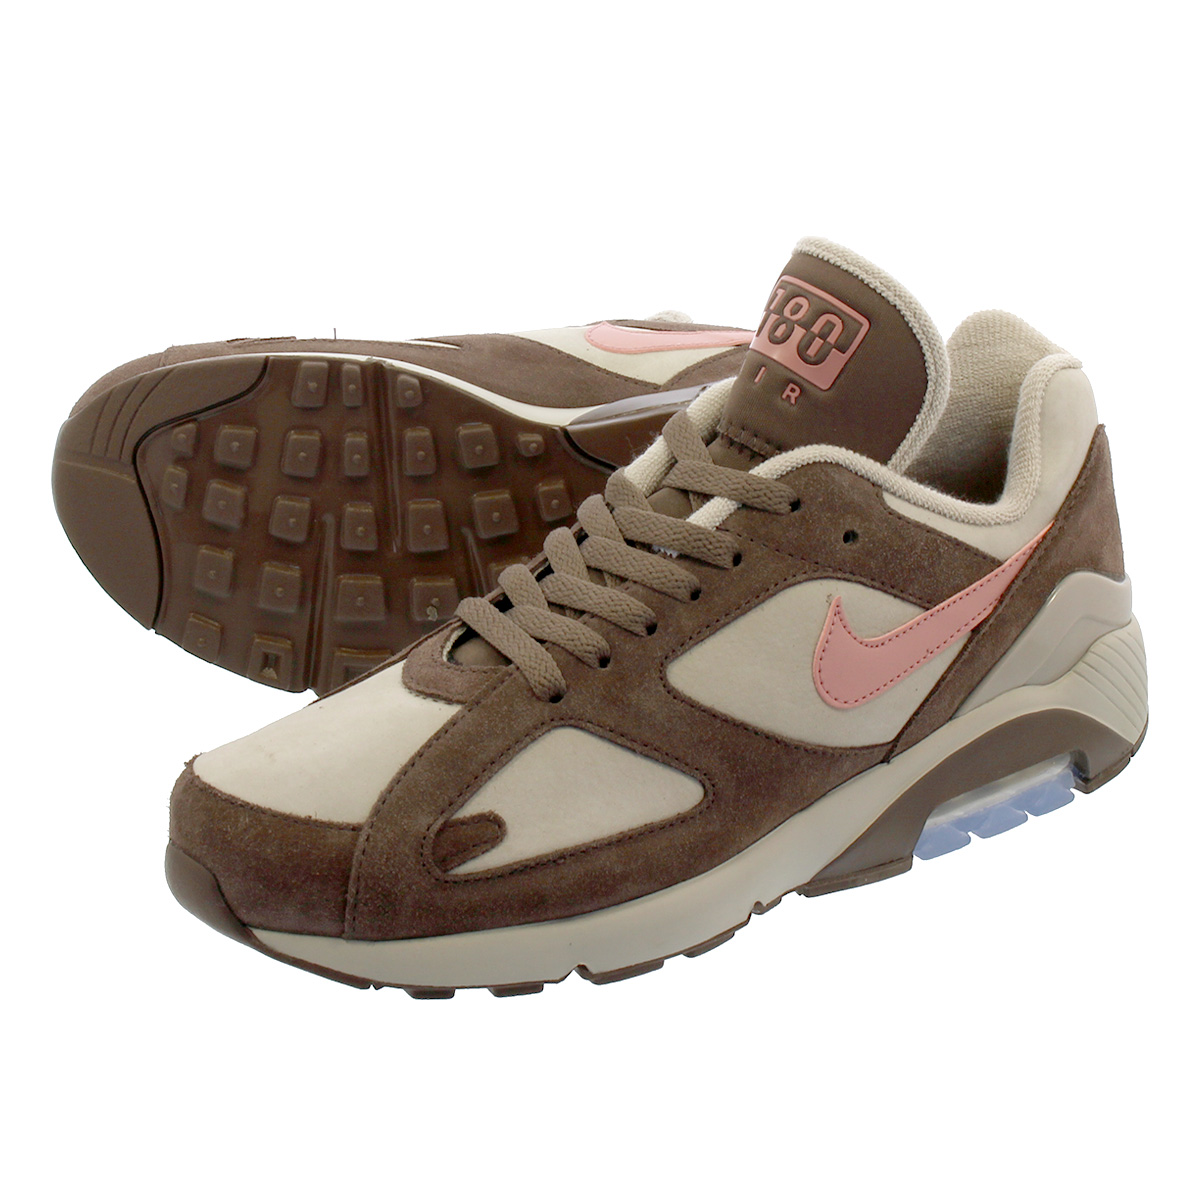 NIKE AIR MAX 180 Nike air max 180 STRINGRUST PINKBAROQUE BROWN av7023 200